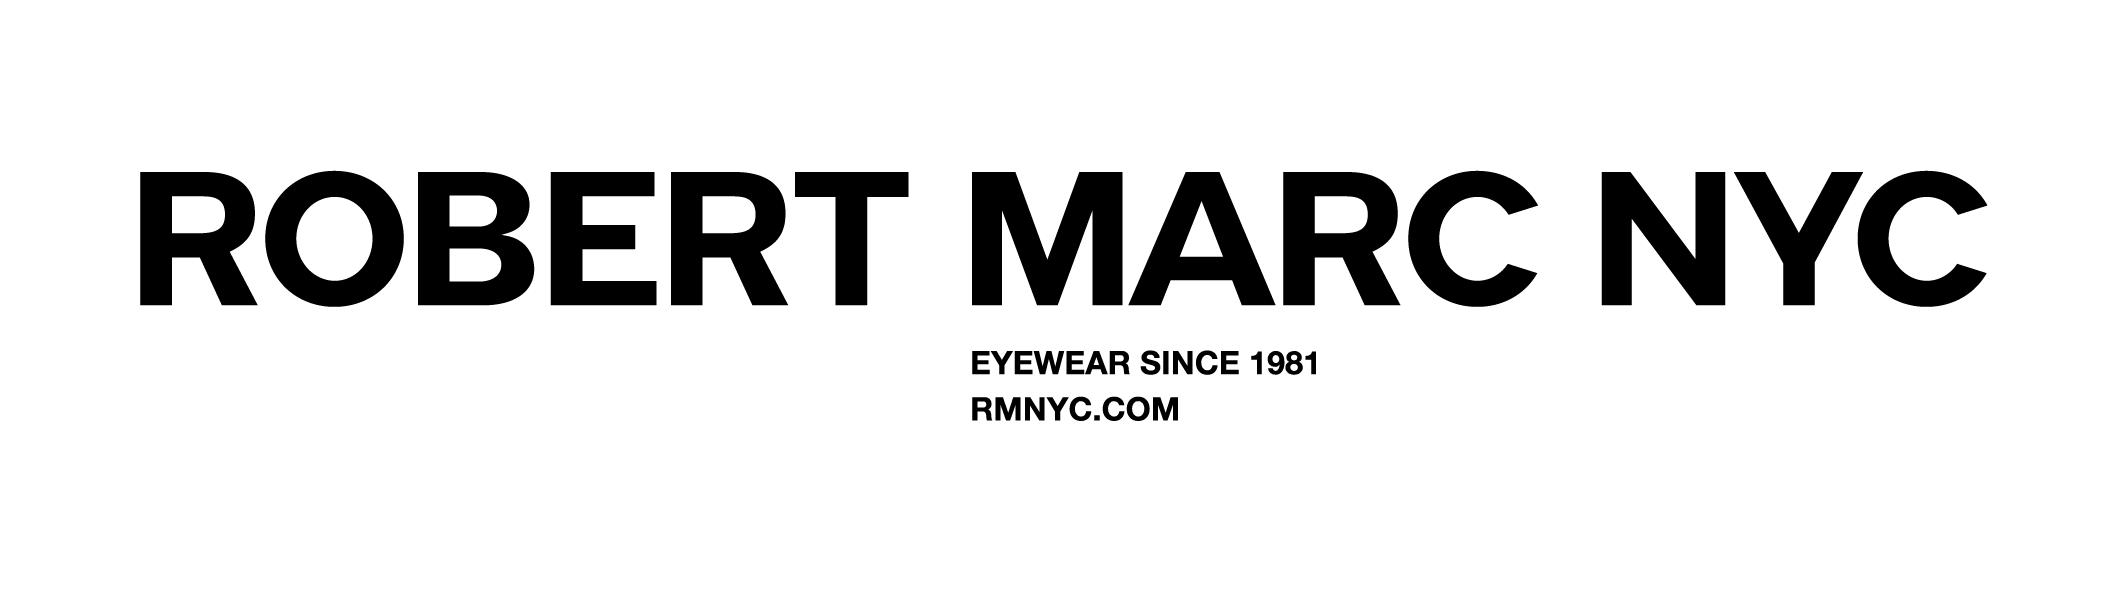 Designing New York's Most Iconic Eyewear Brand